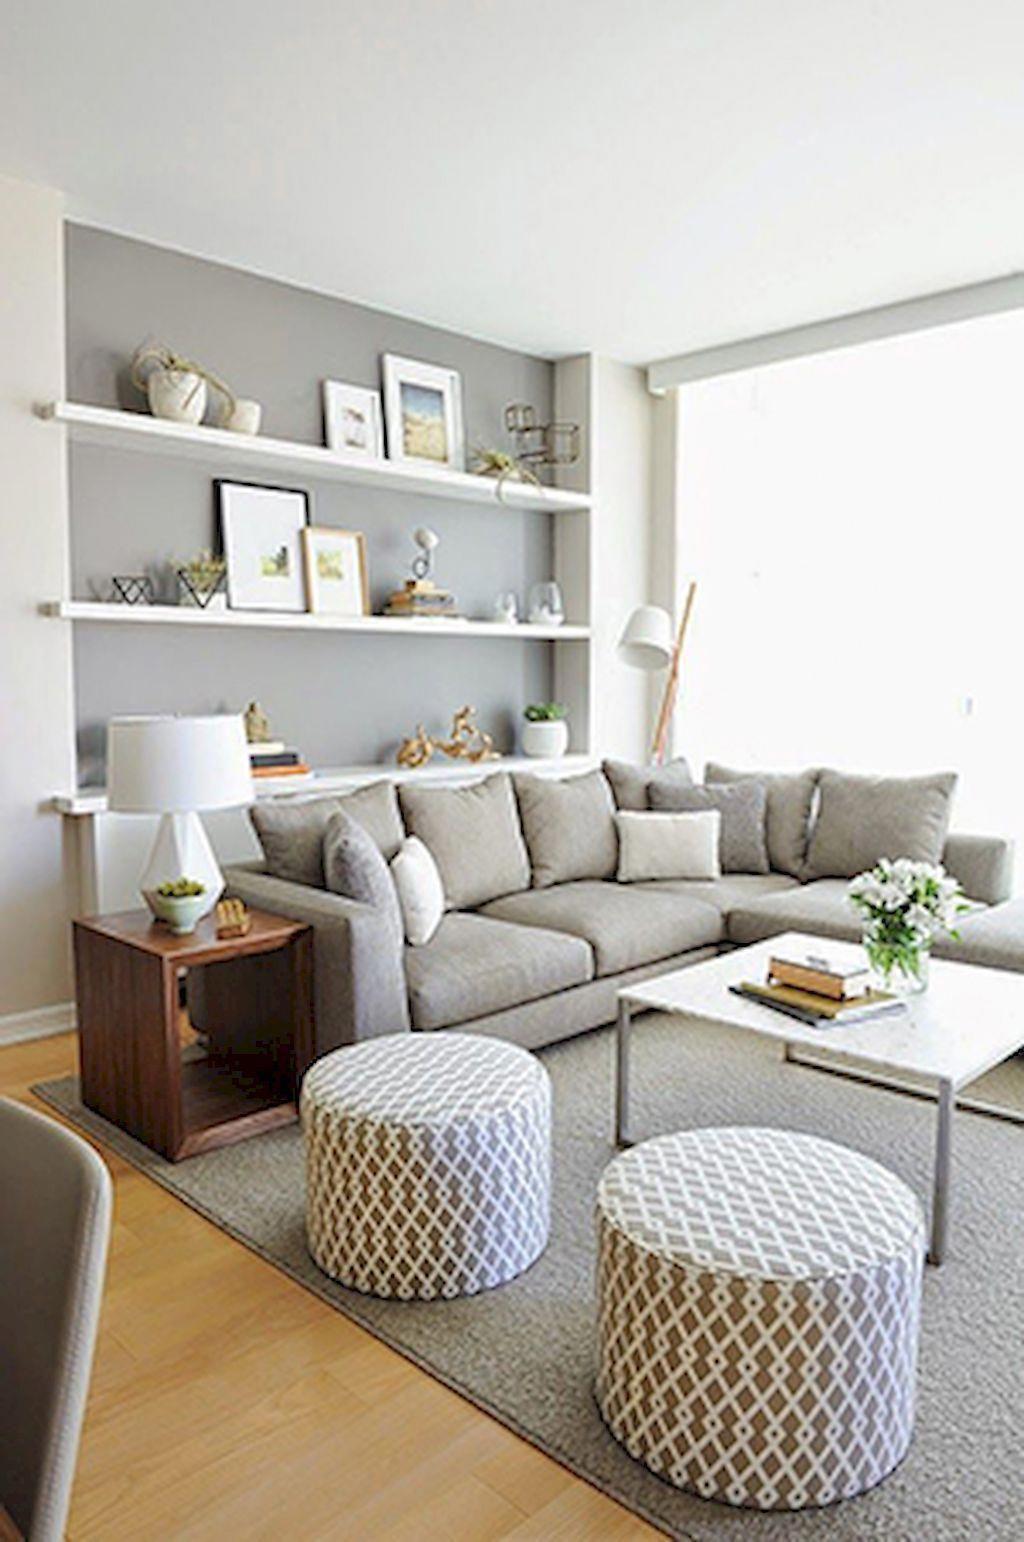 Small Living Room Ideas #SmallLivingRoomDecorIdeas Tiny Living Room Ideas  Apartment, Small Open Plan Living